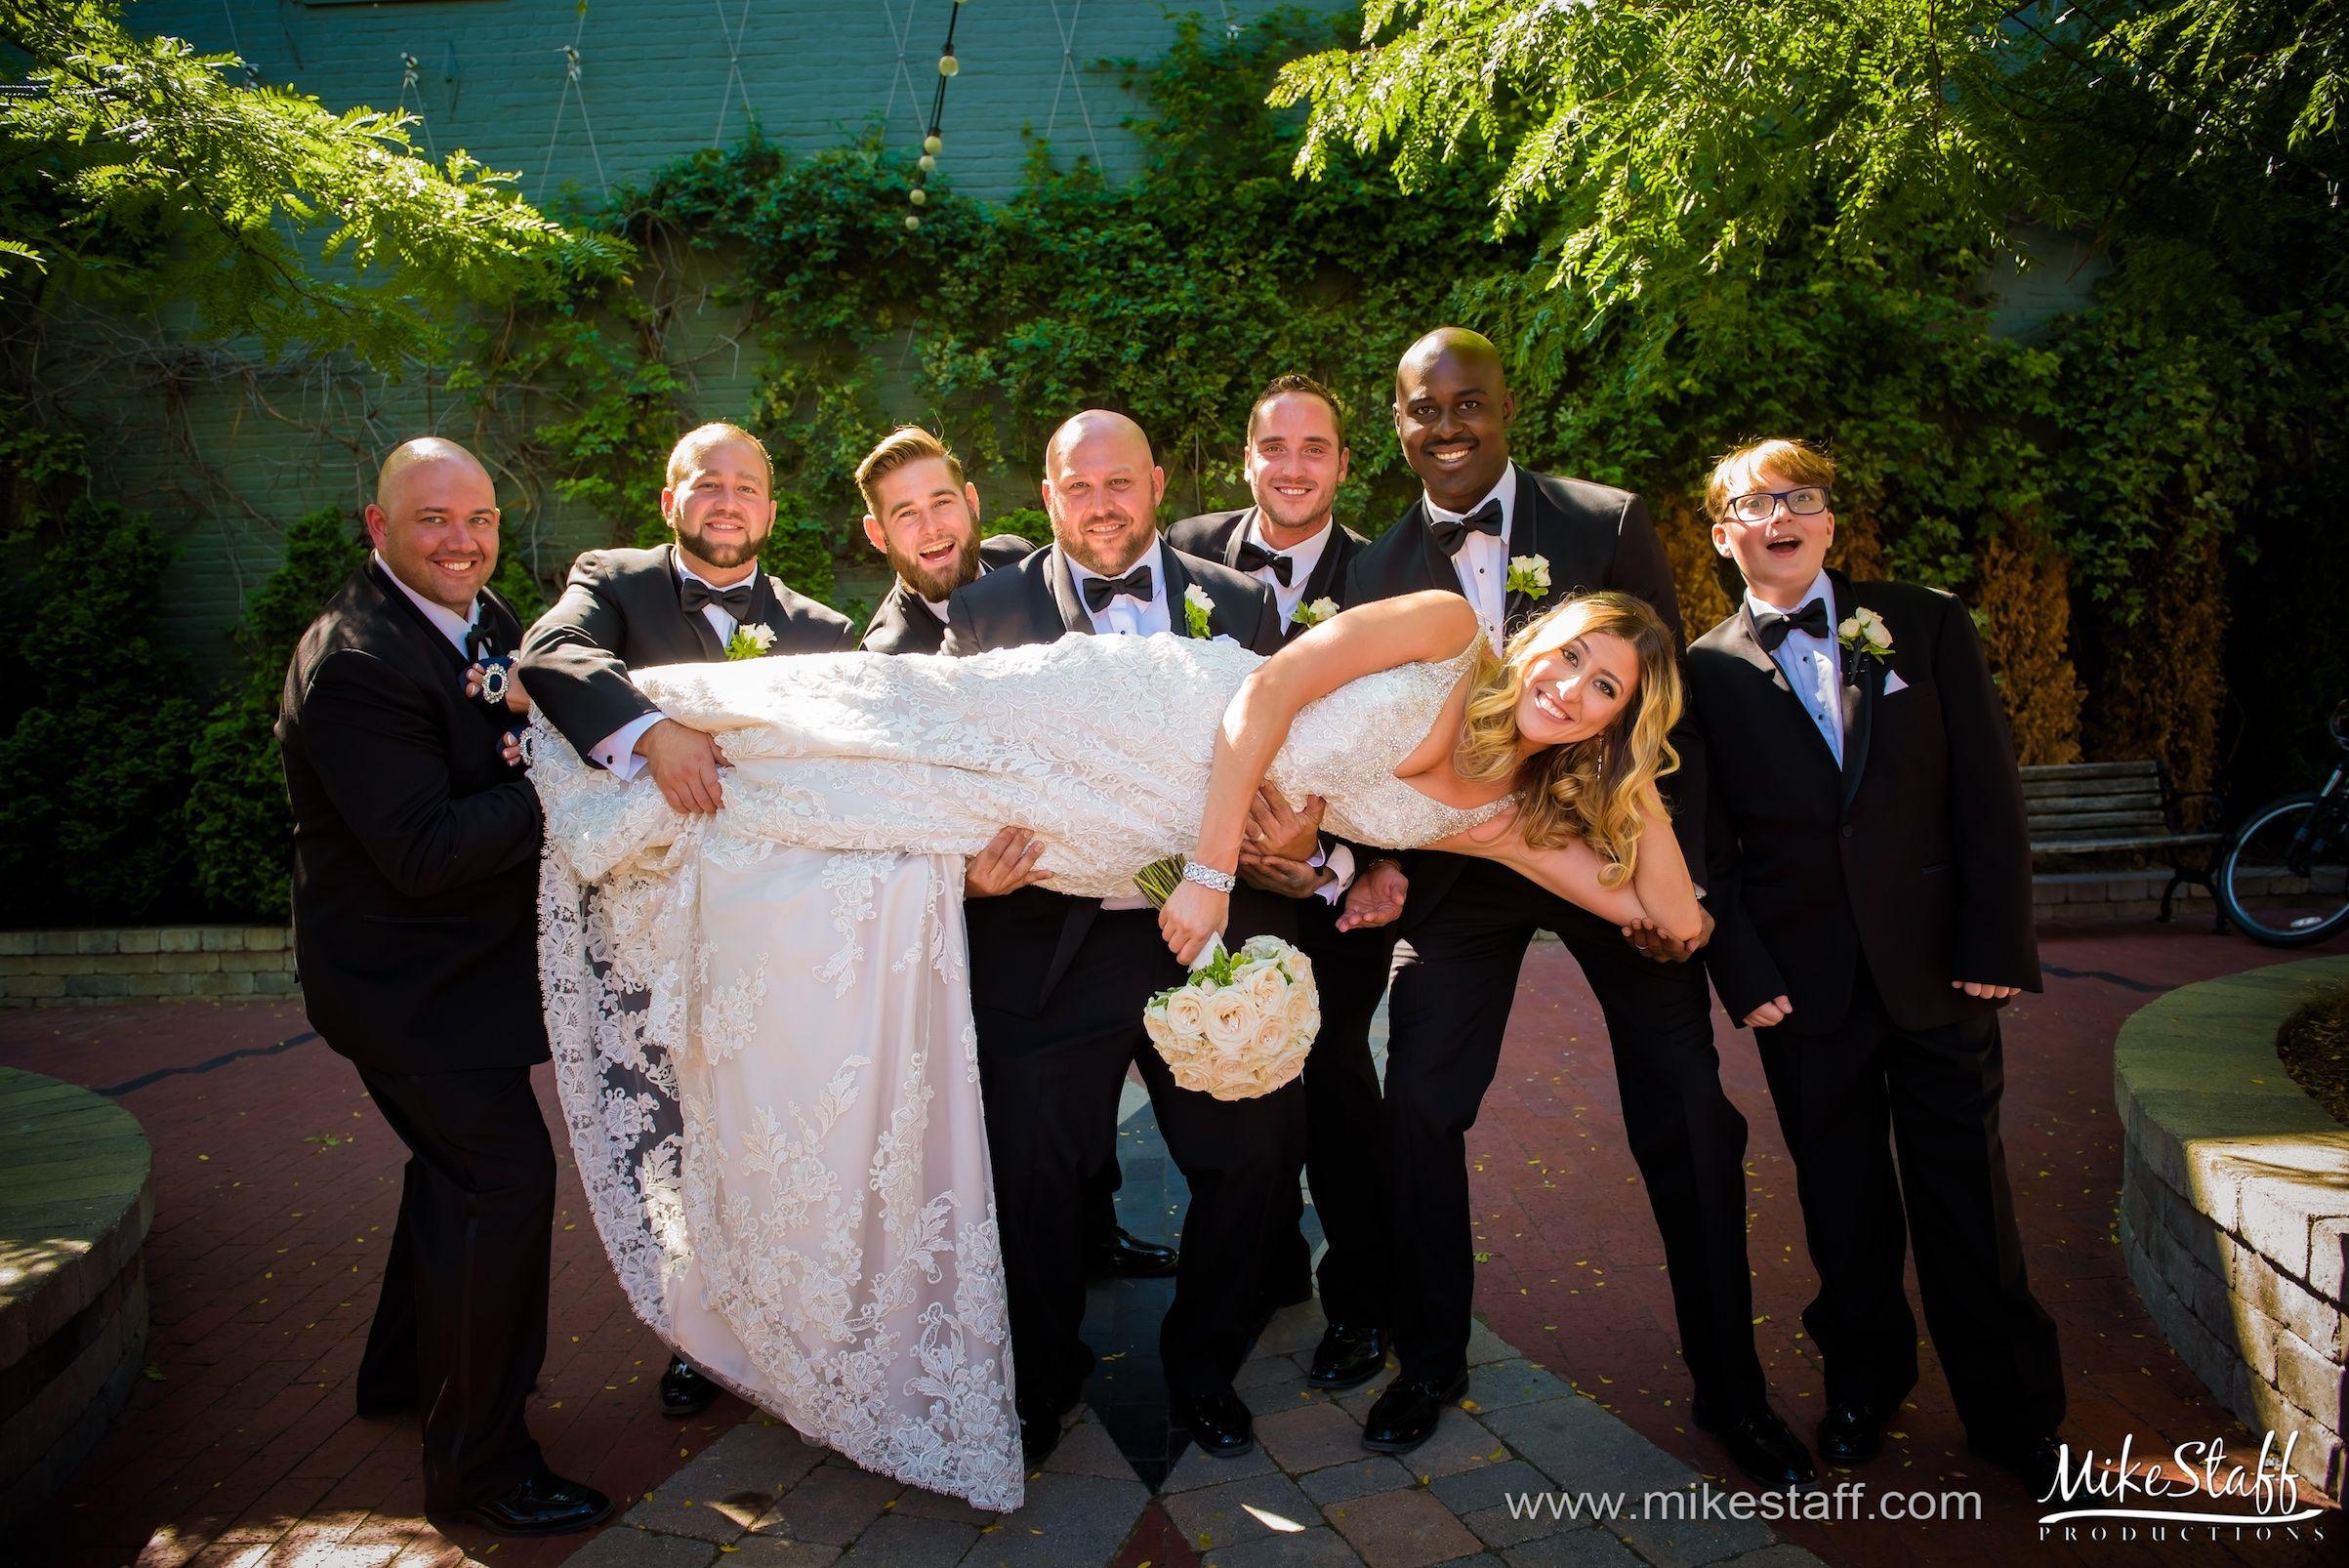 Groomsmen hold up bride #Michiganwedding #Michiganwedding #Chicagowedding #MikeStaffProductions #wedding #reception #weddingphotography #weddingdj #weddingvideography #wedding #photos #wedding #pictures #ideas #planning #DJ #photography #bride #groom